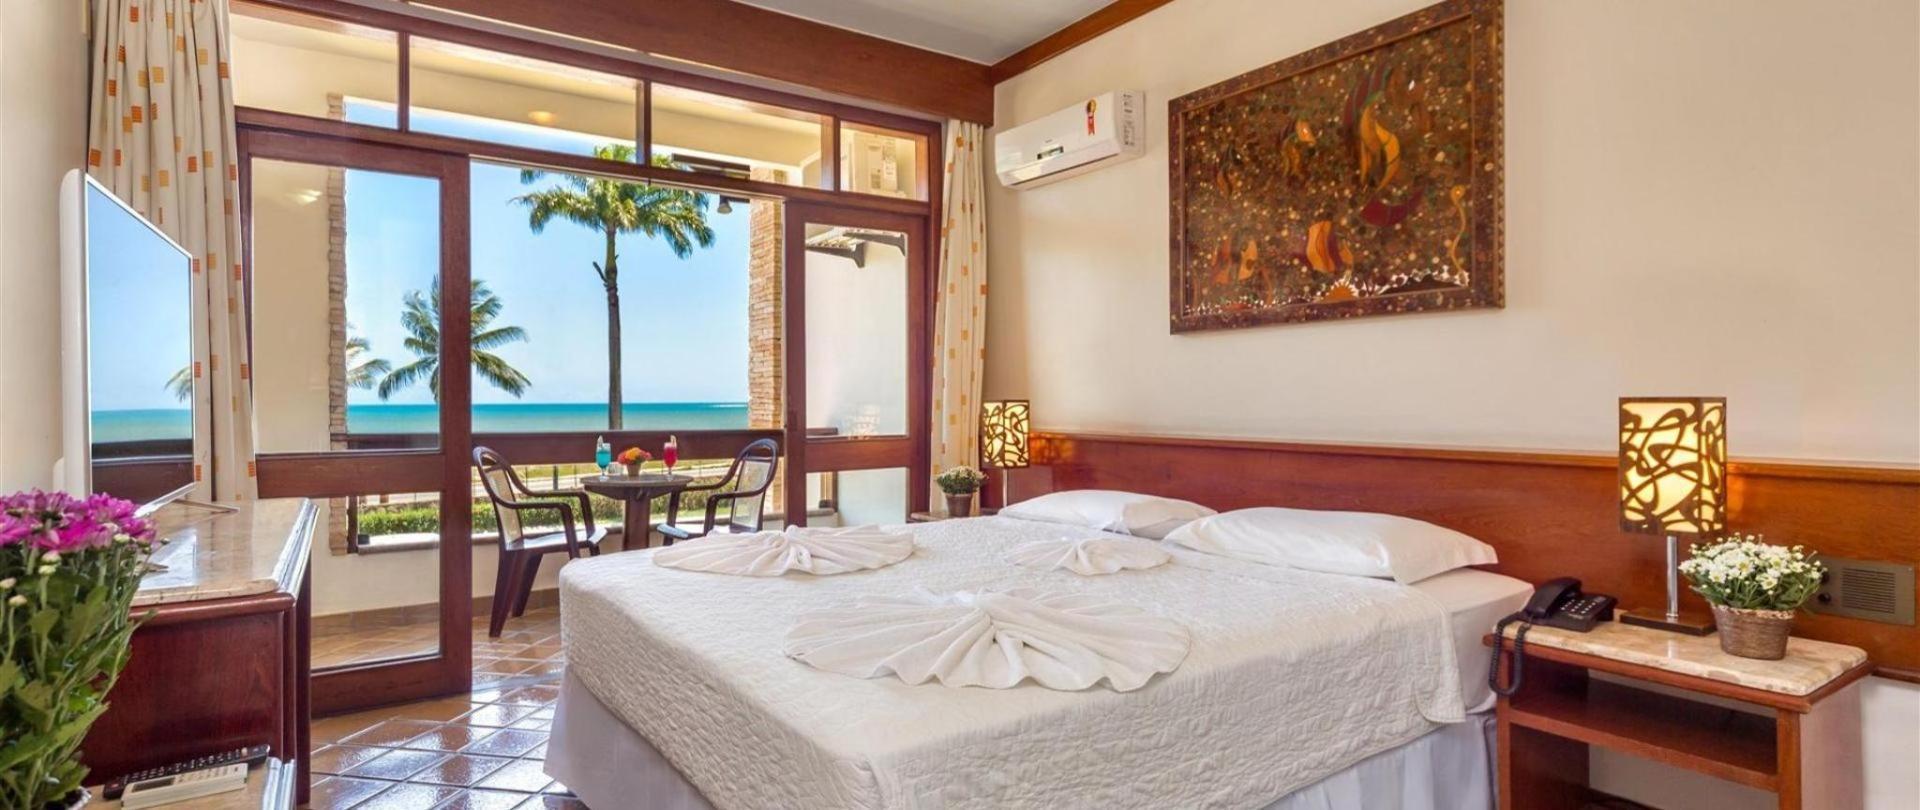 Quinta do Sol Hotel_Porto Seguro_Bahia (8).jpg